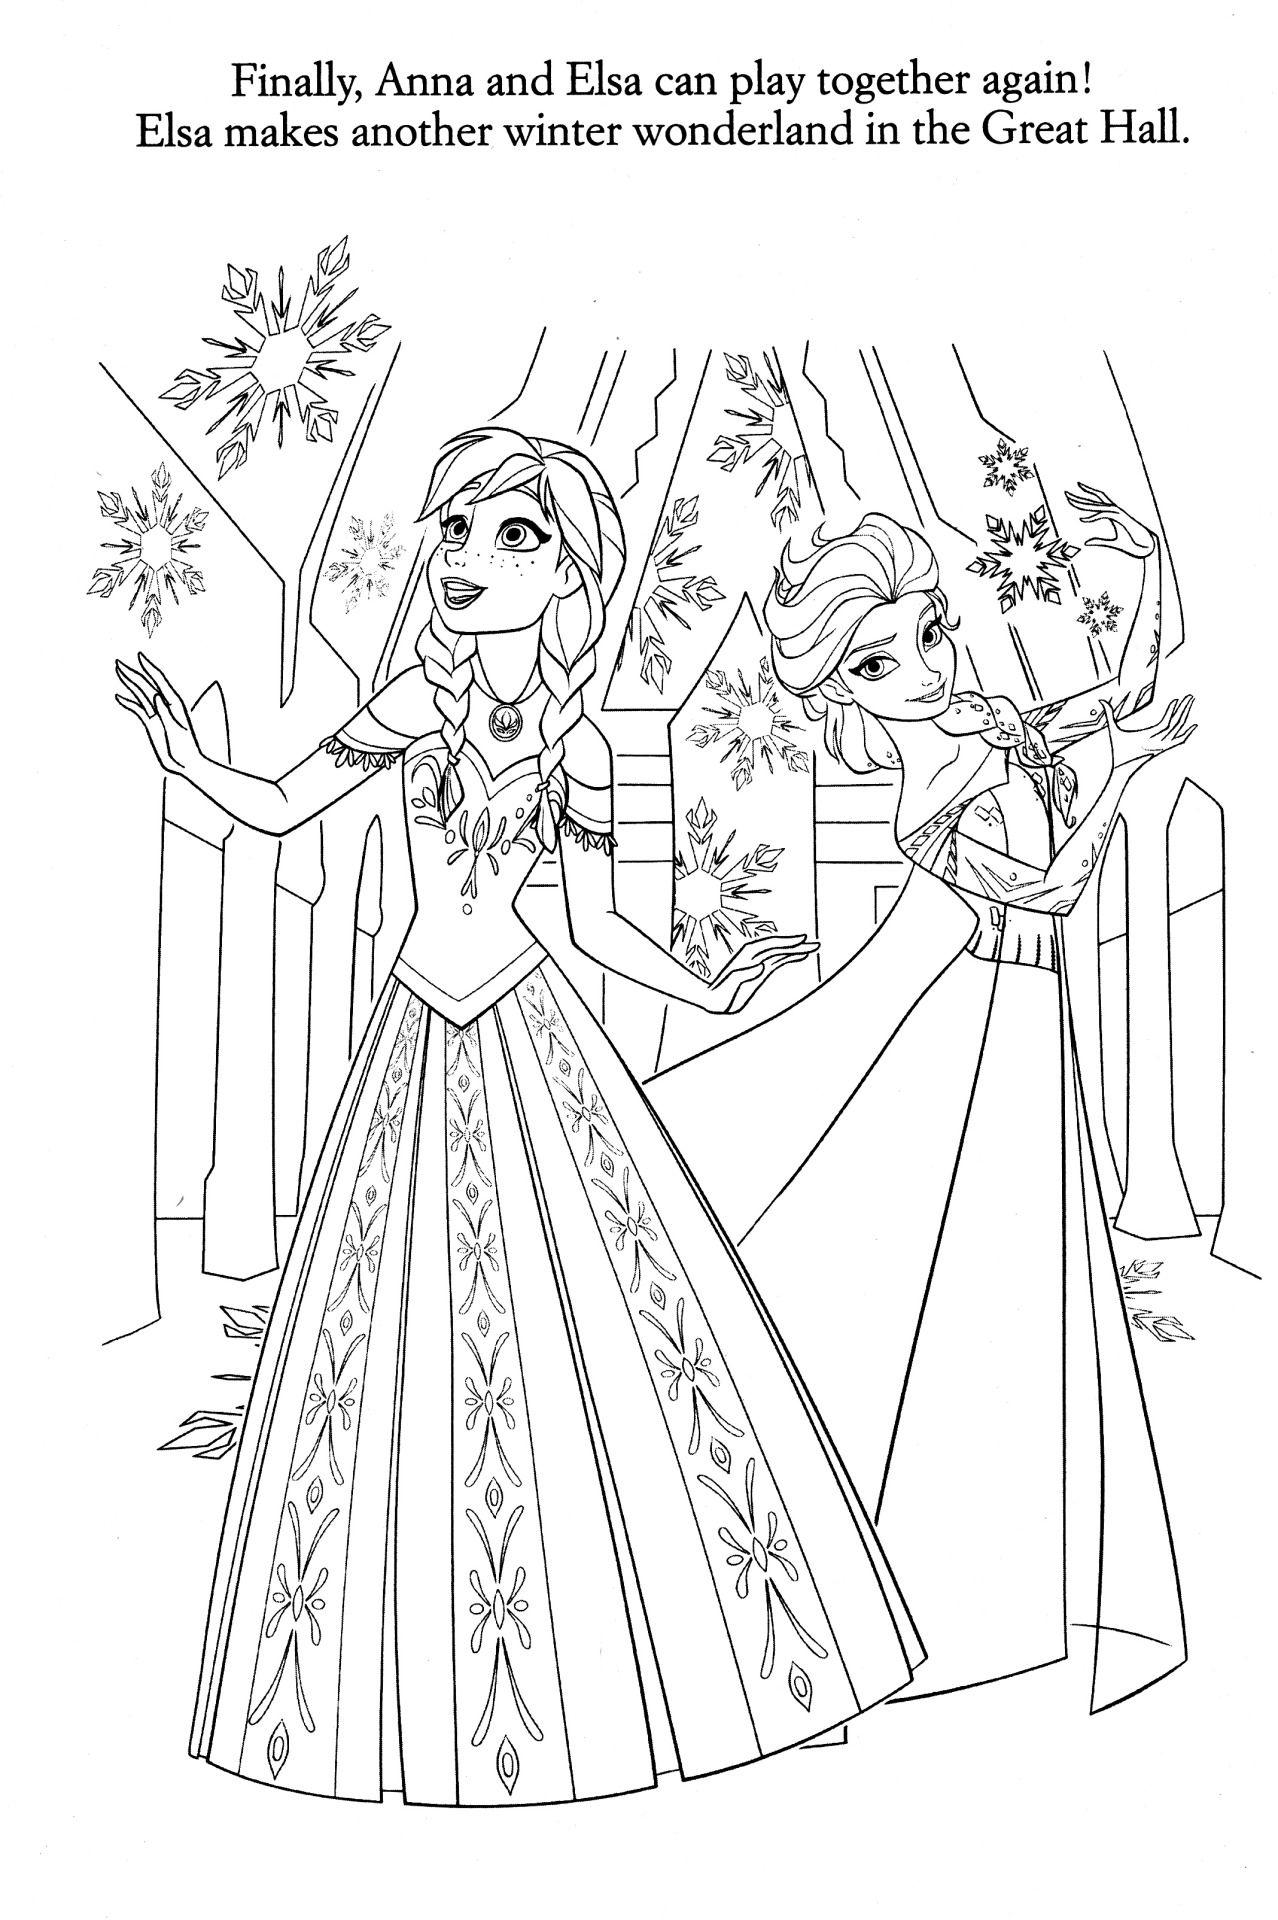 Disney Coloring Pages Boyama Sayfalari Adult Coloring Pages